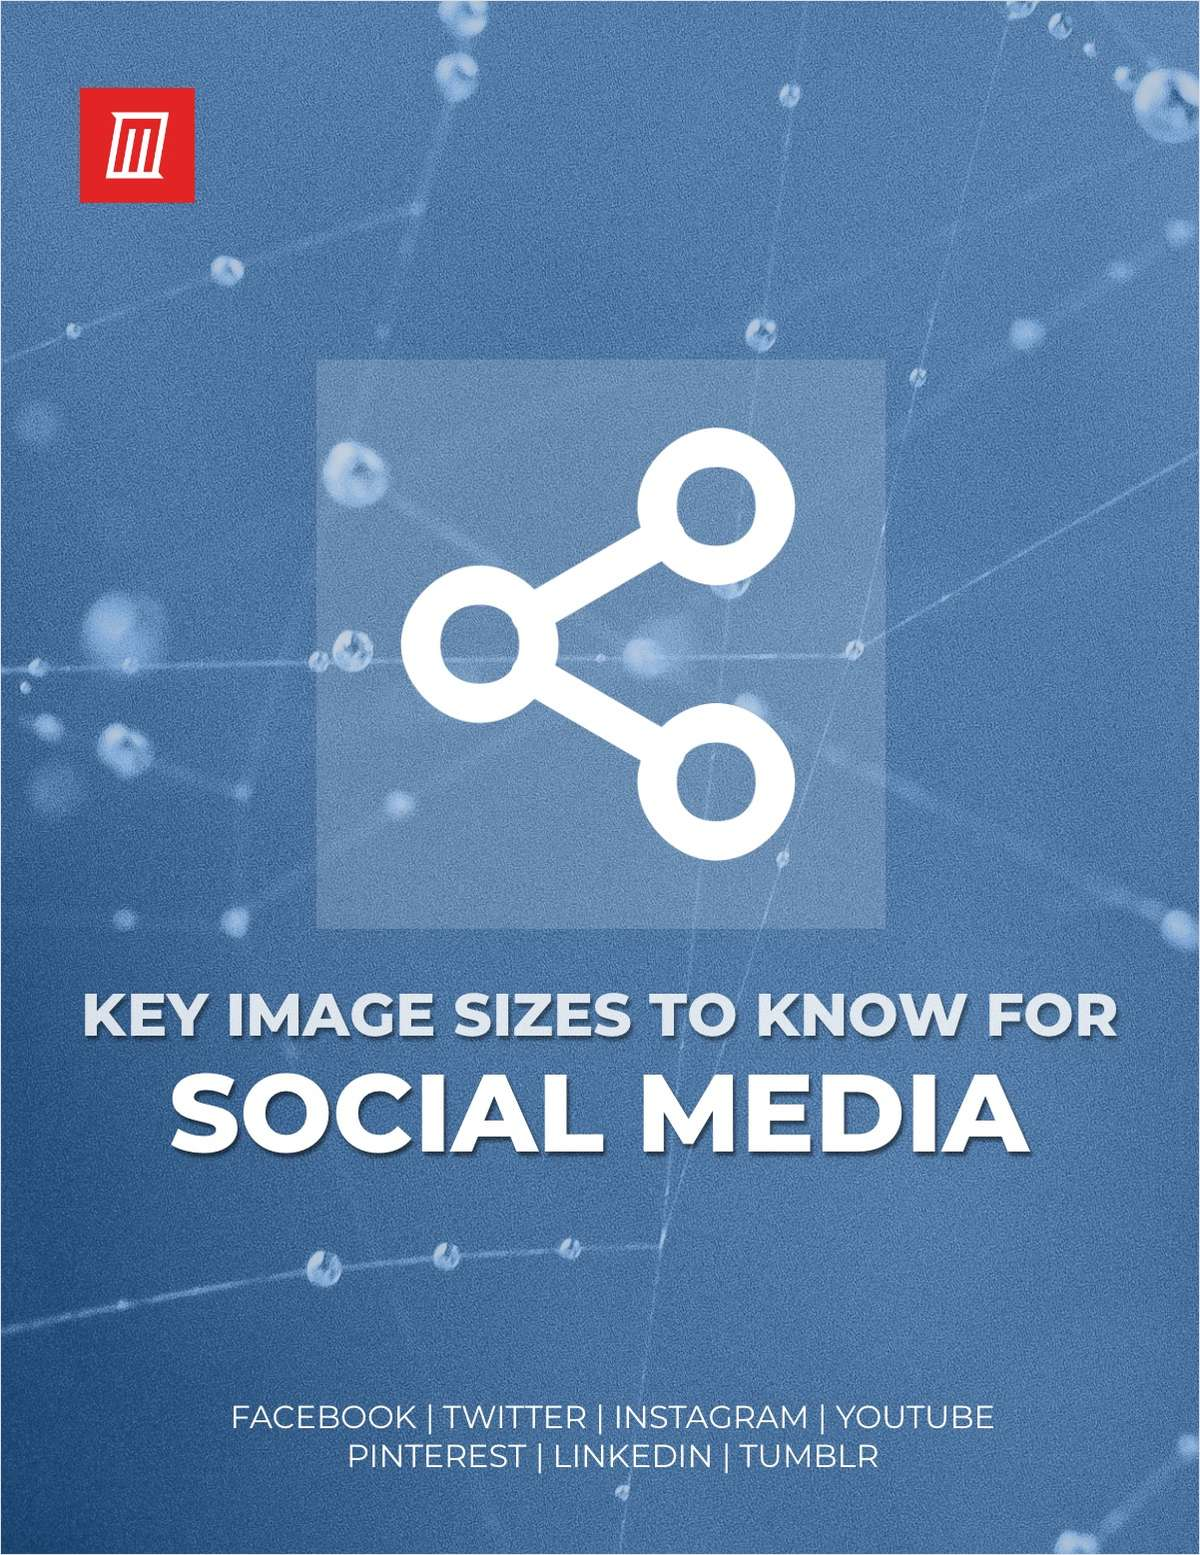 Key Image Sizes for Your Favorite Social Media Websites